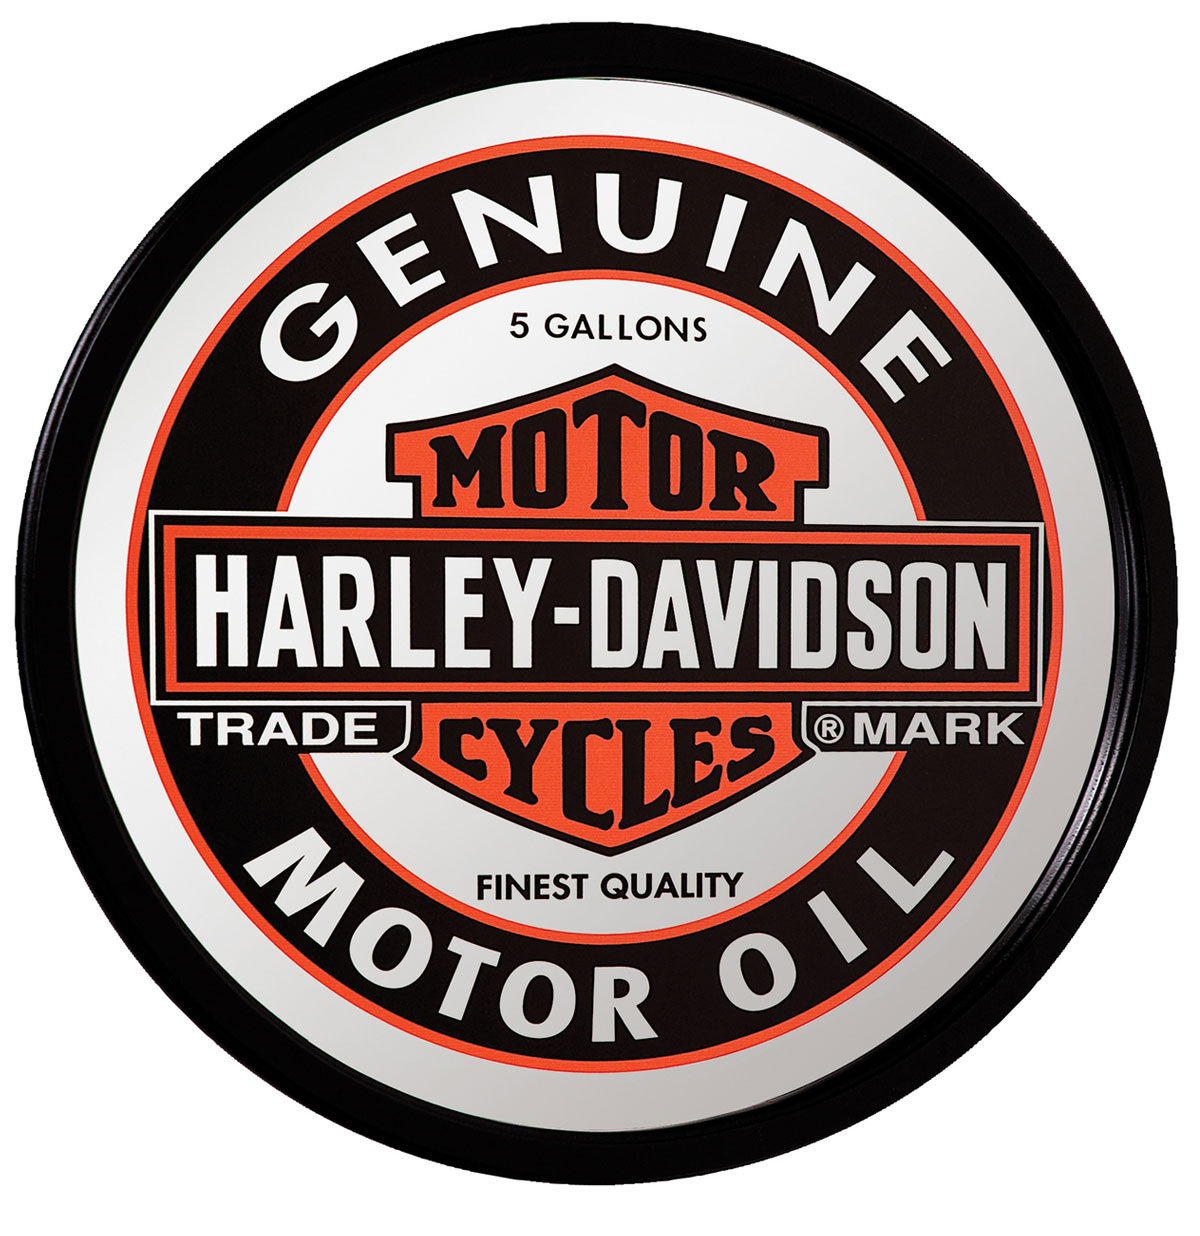 Harley-Davidson Oil Can Spiegel - LAATSTE KANS